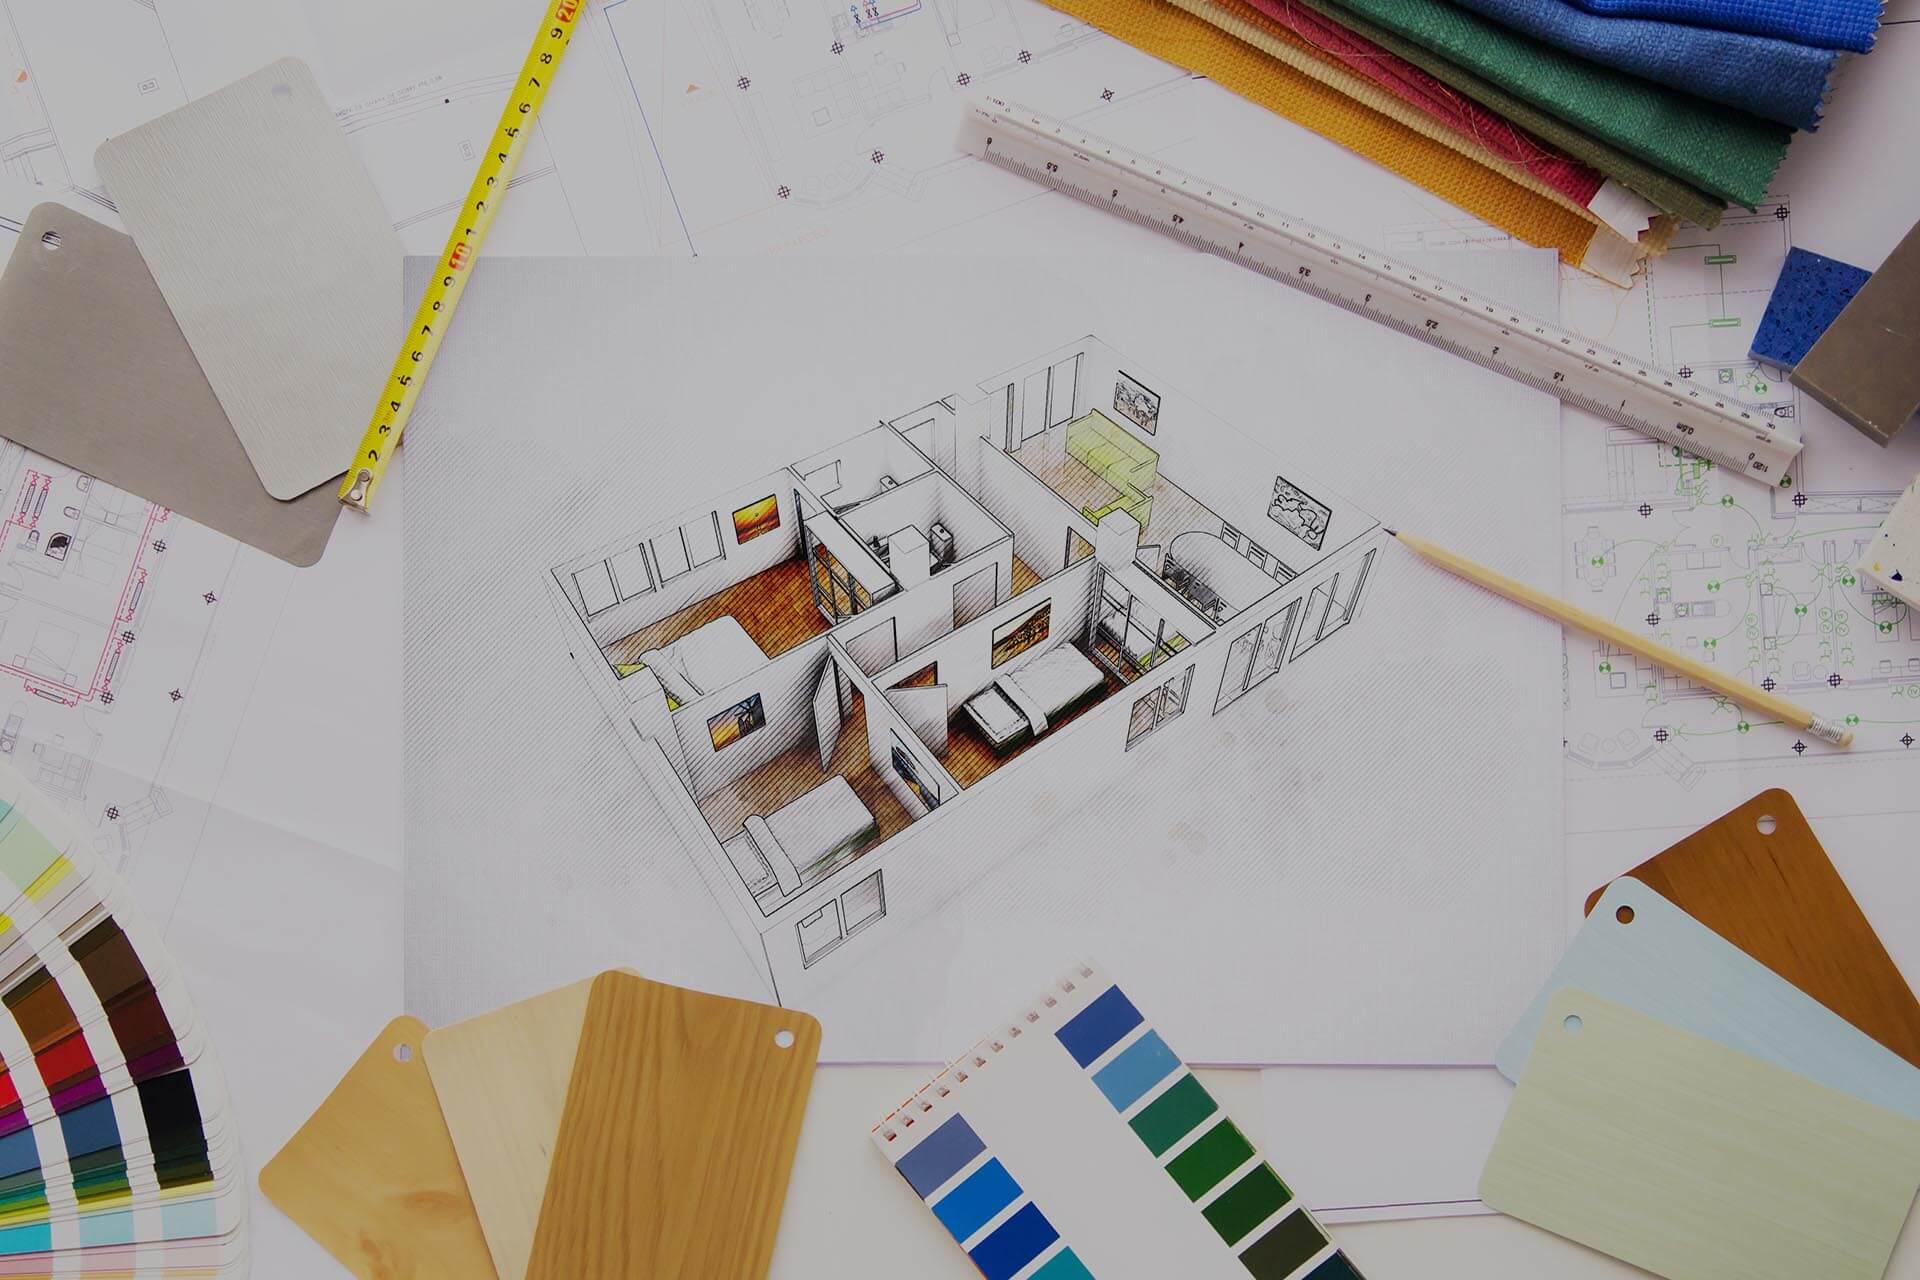 https://spektra.global/interior-design/wp-content/uploads/2020/12/We-Design.jpg